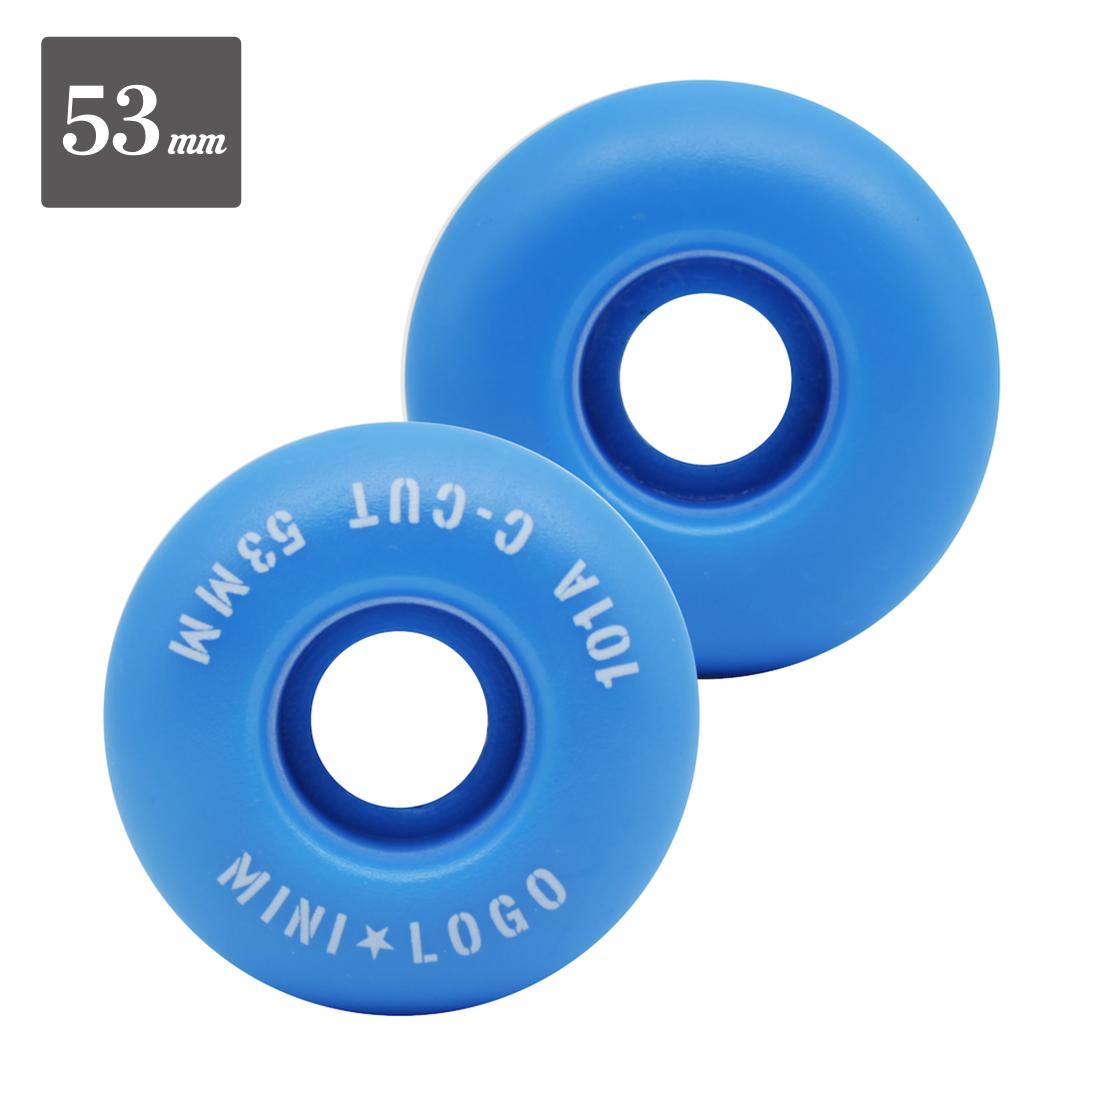 【MINI-LOGO】Wheel